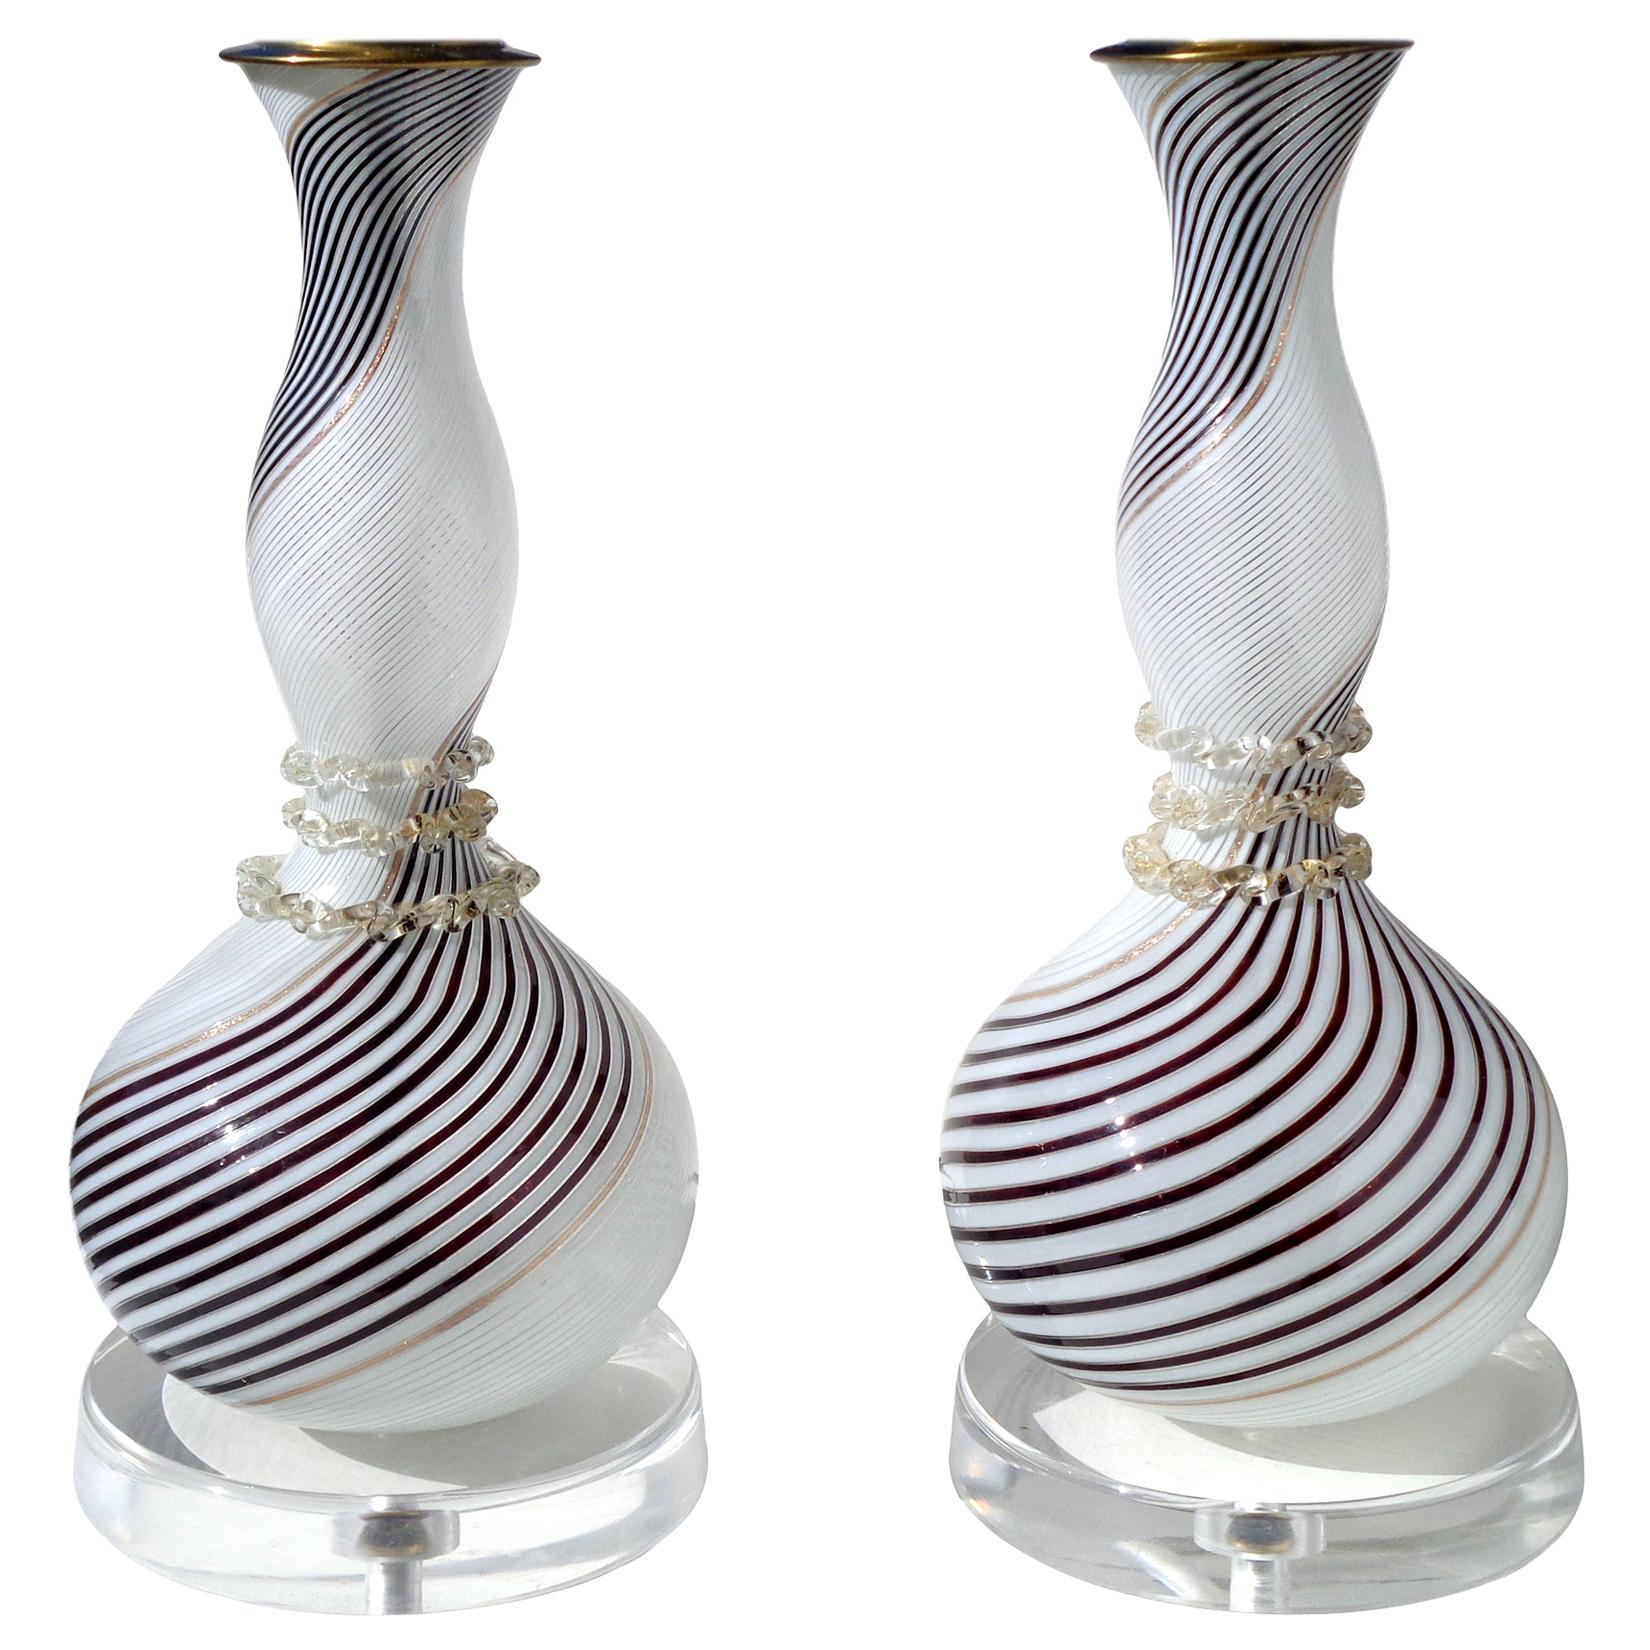 Dino Martens Aureliano Toso Murano Black White Gold Italian Art Glass Lamps